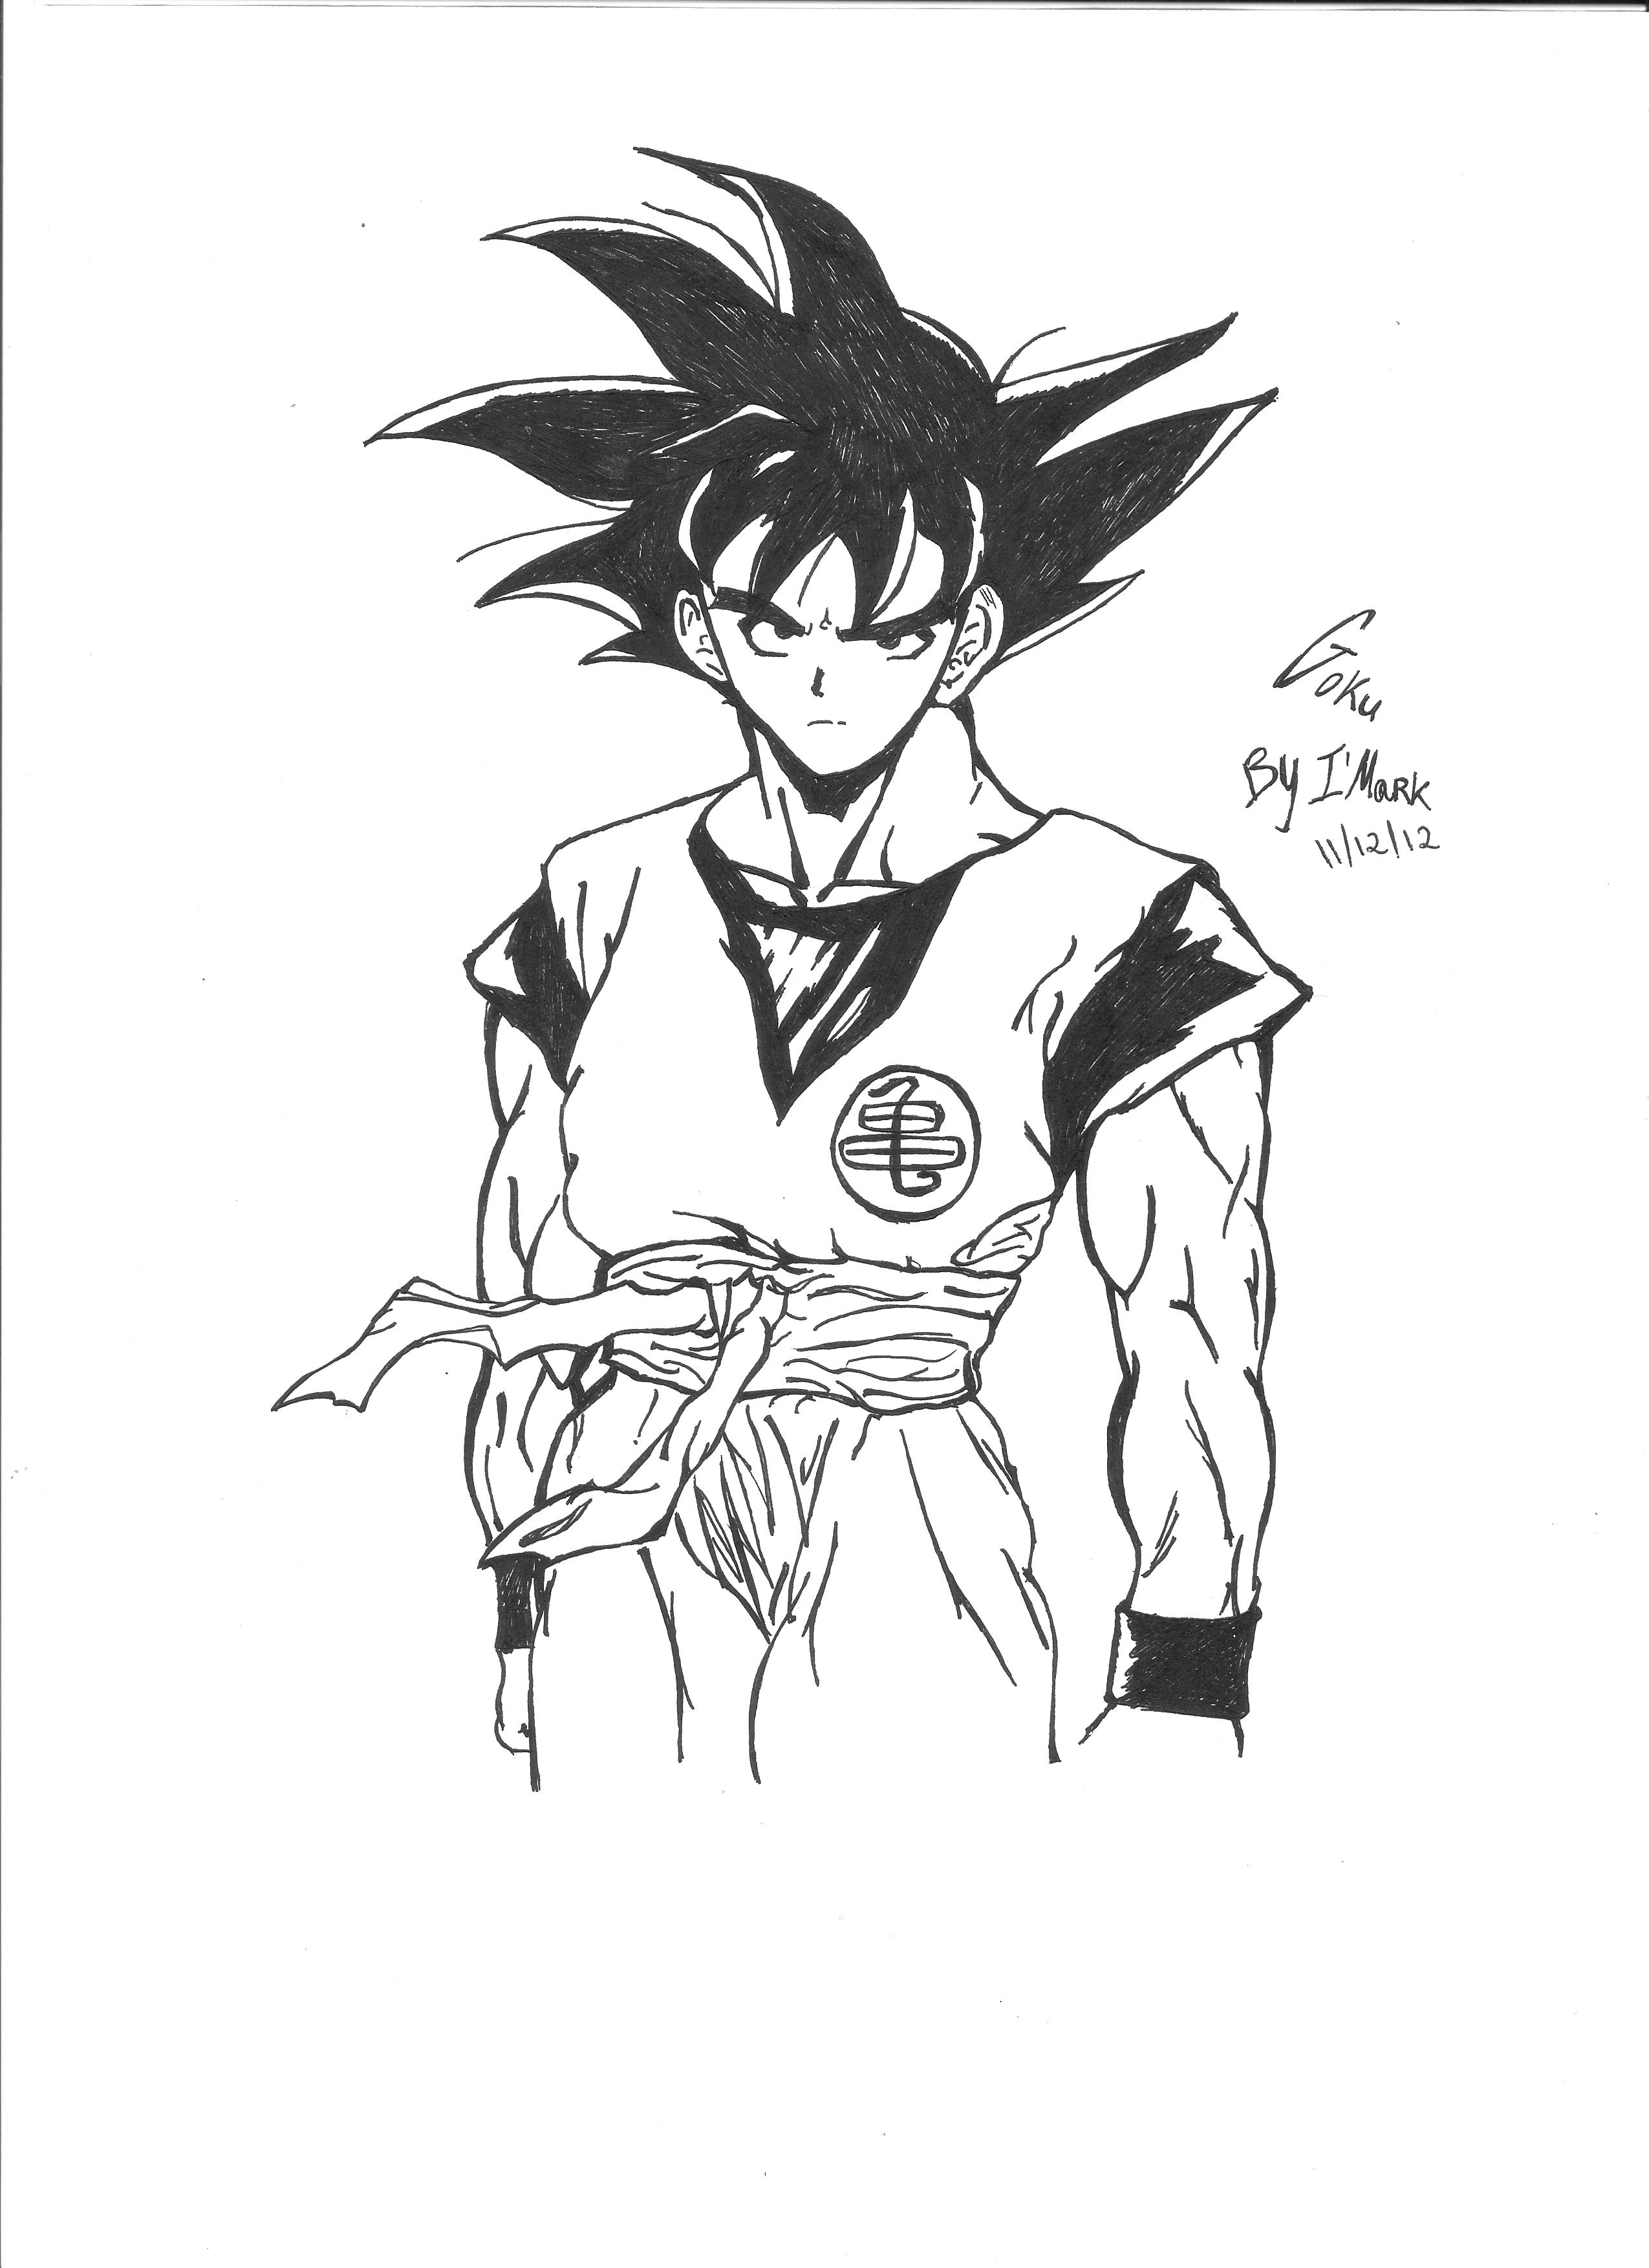 Drawing Of Goku - Dragon Ball Z By Markth23 On DeviantArt